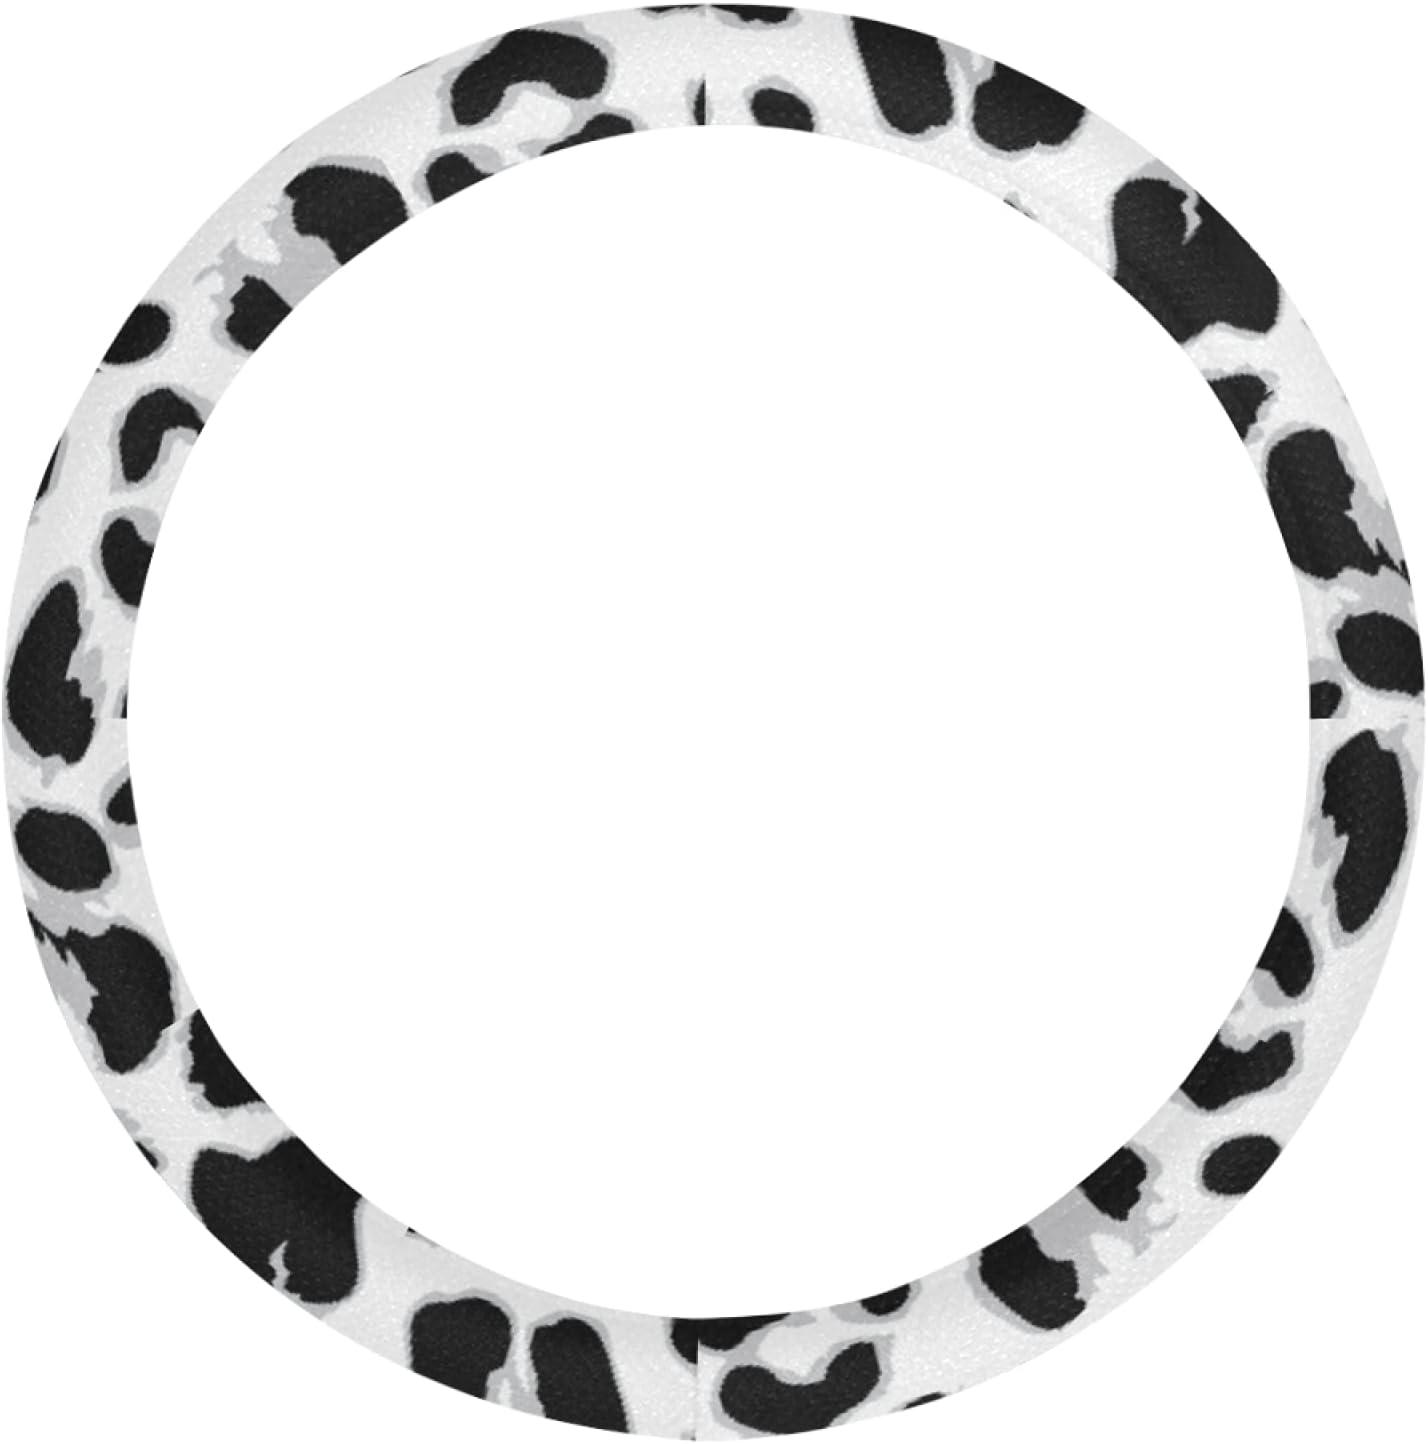 AIKENING Fun Colorado Springs Mall Dallas Mall Steering Wheel Cover Leopard Girls Wh Skin